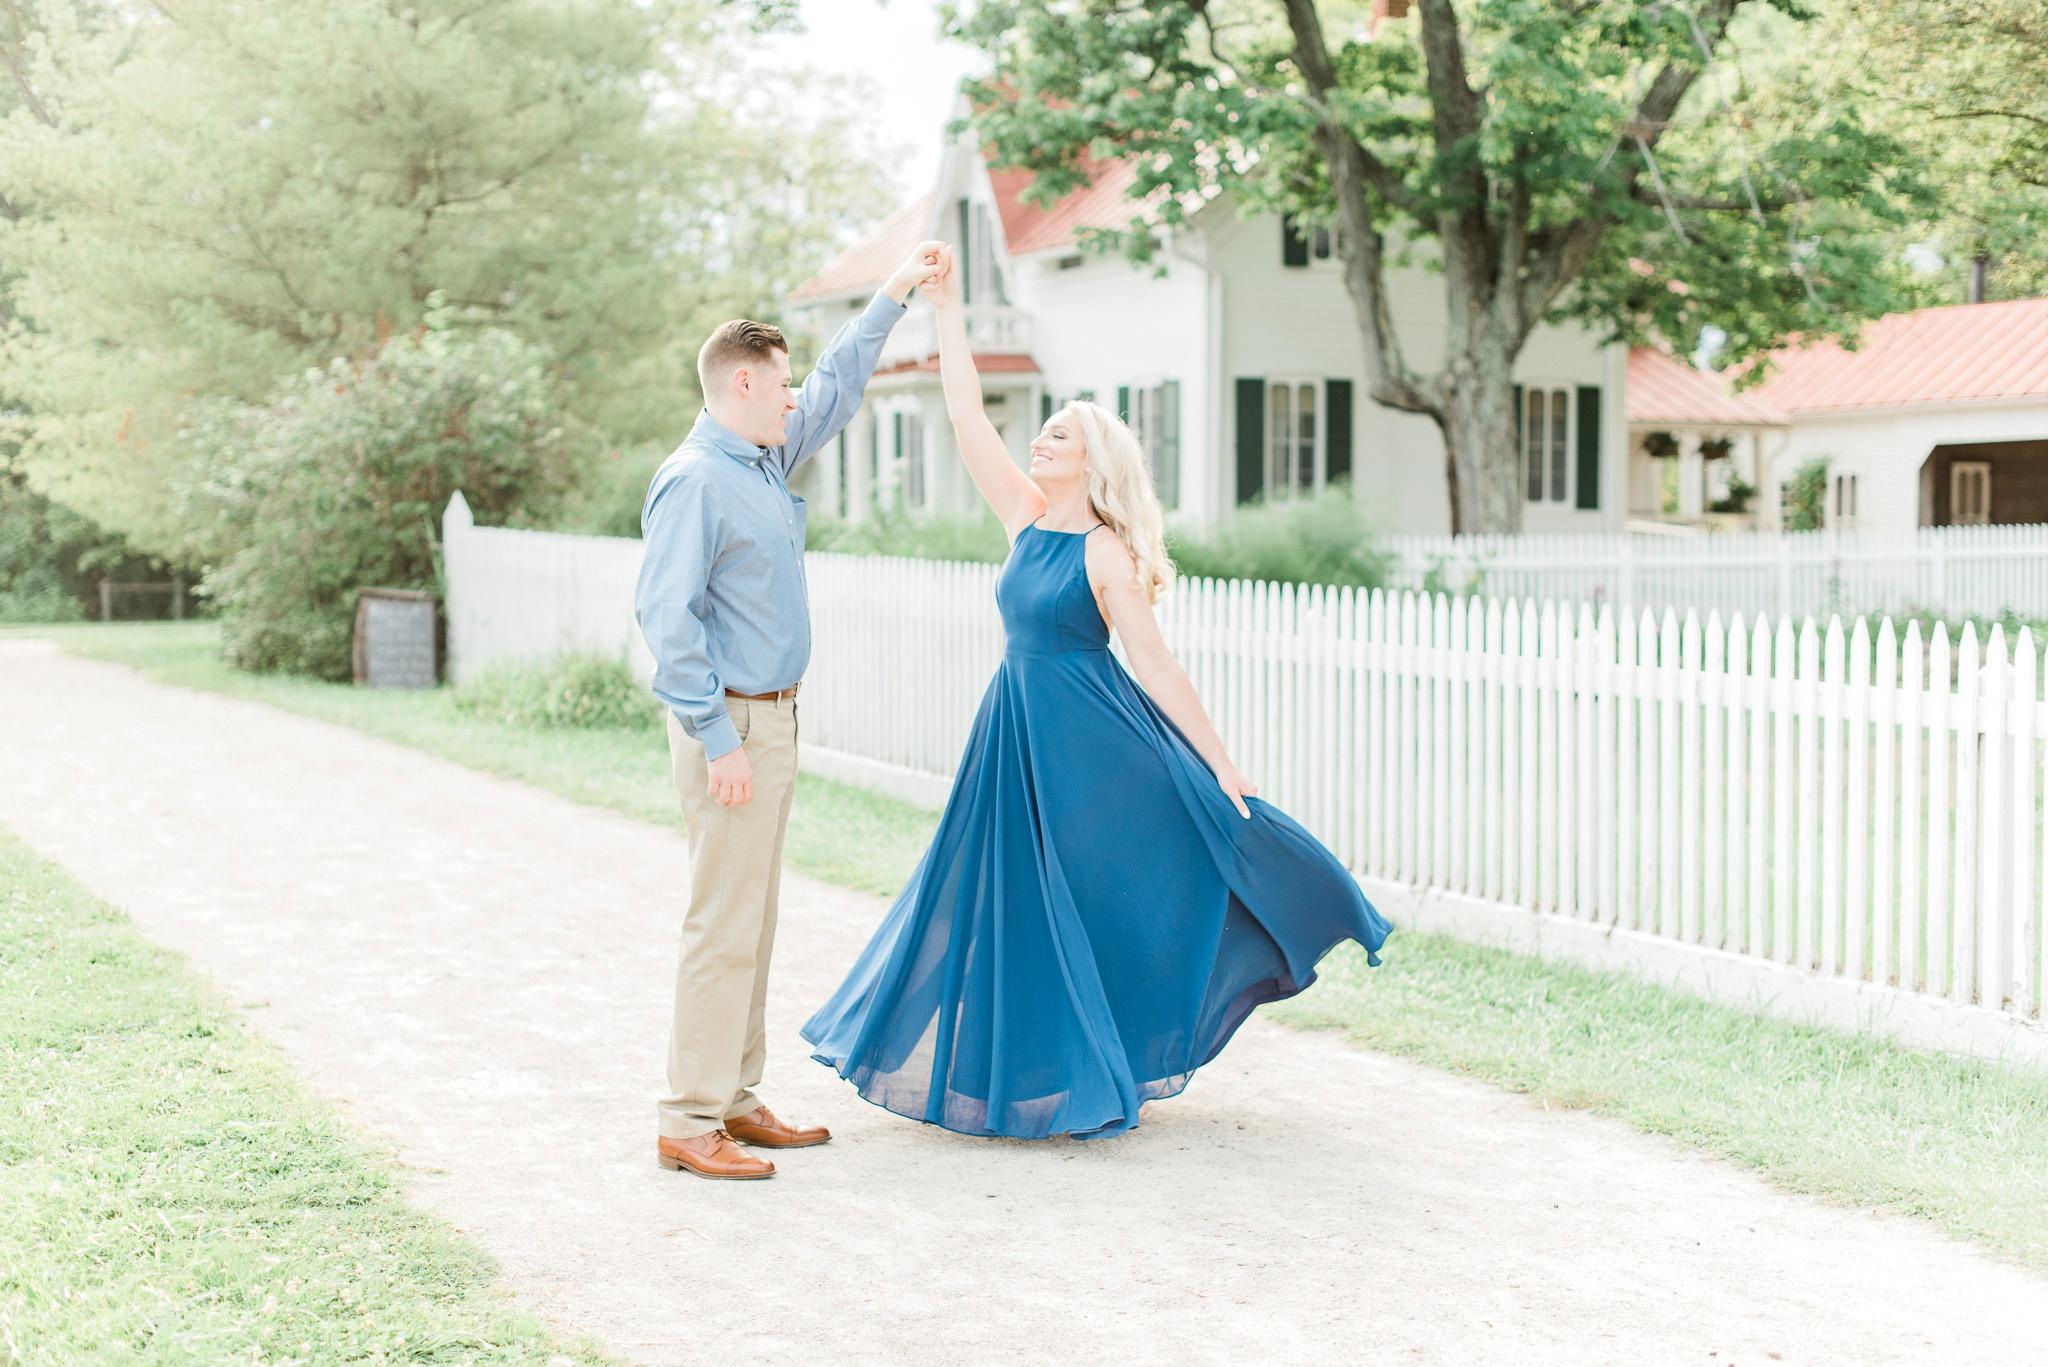 slate-run-metro-park-engagement-columbus-wedding-photographer-19.jpg